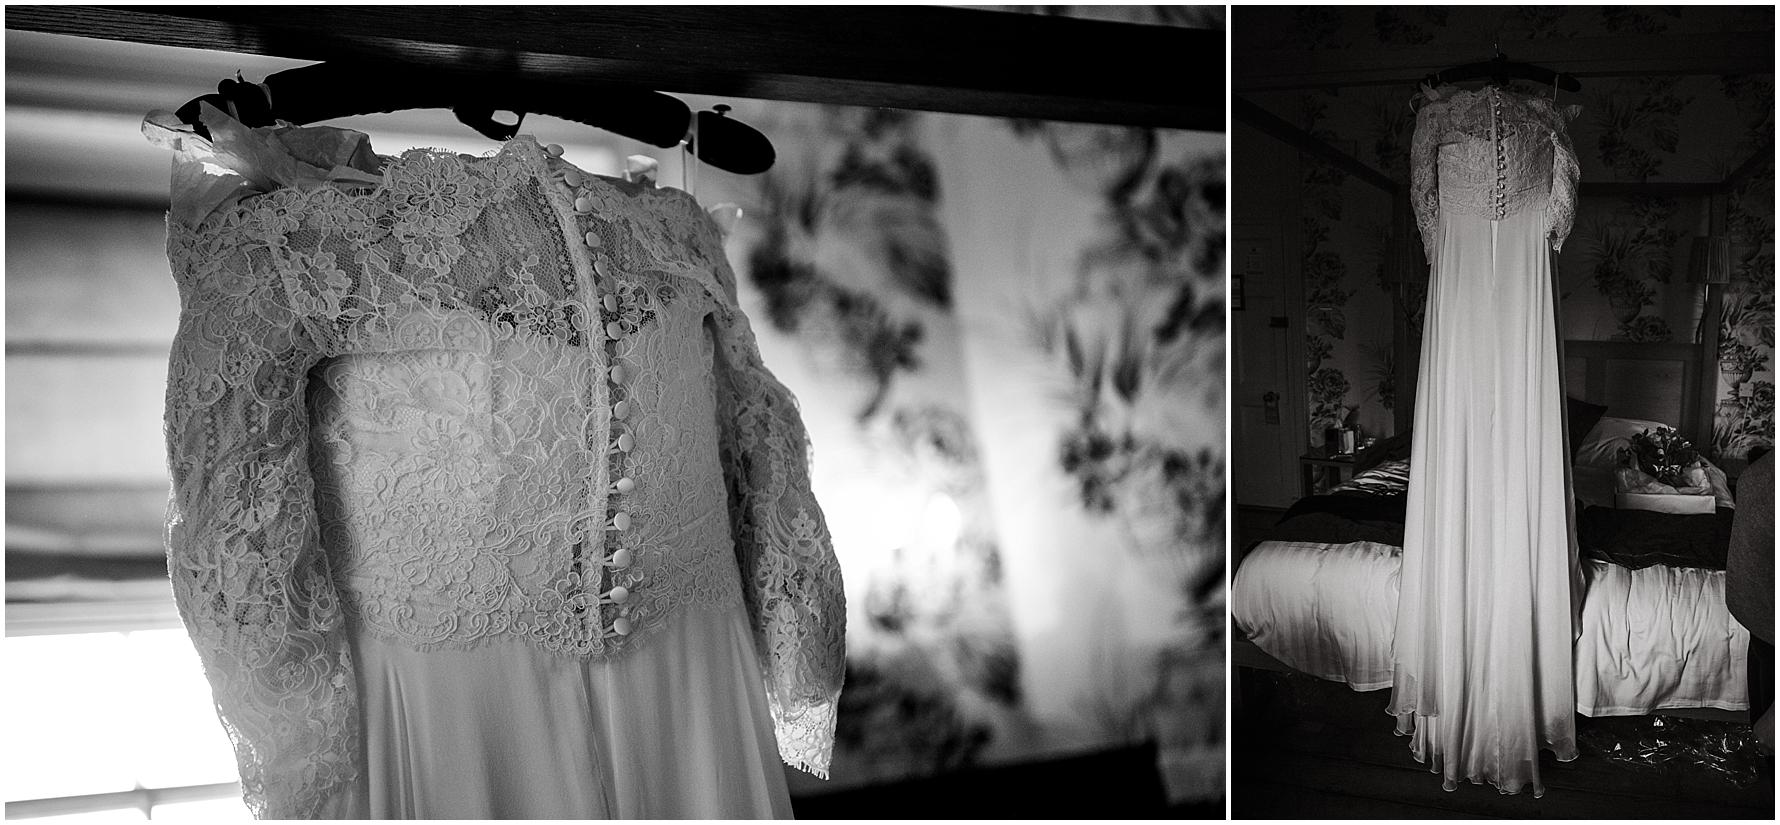 Wedding Dress - Cheshire Wedding Photography